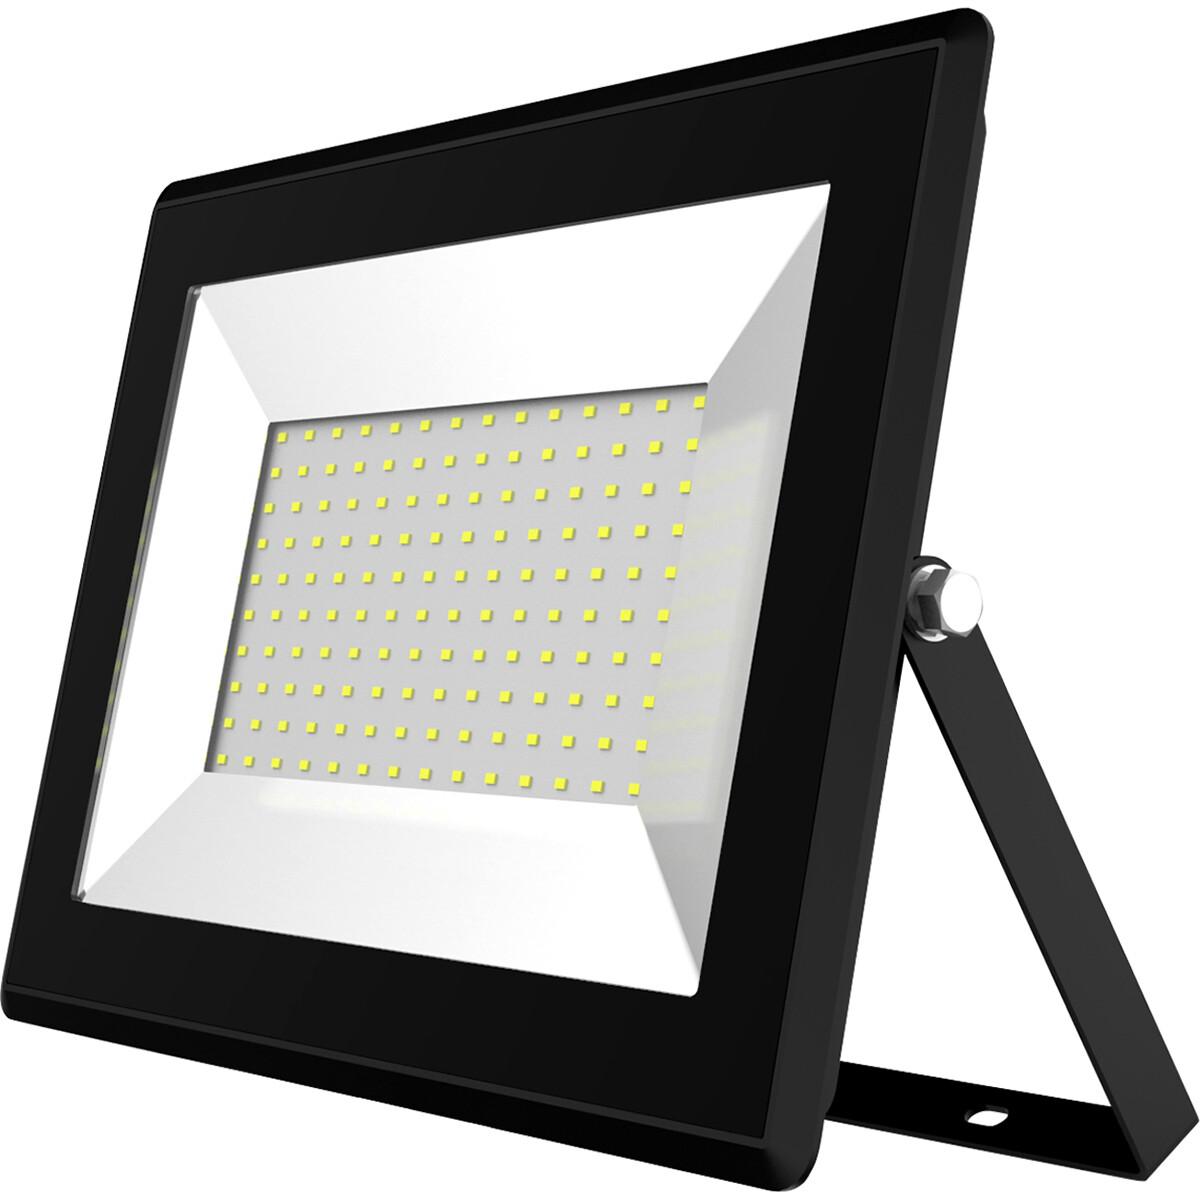 LED Bouwlamp 100 Watt - LED Schijnwerper - Aigi Iglo - Helder/Koud Wit 6400K - Waterdicht IP65 - Mat Zwart - Aluminium